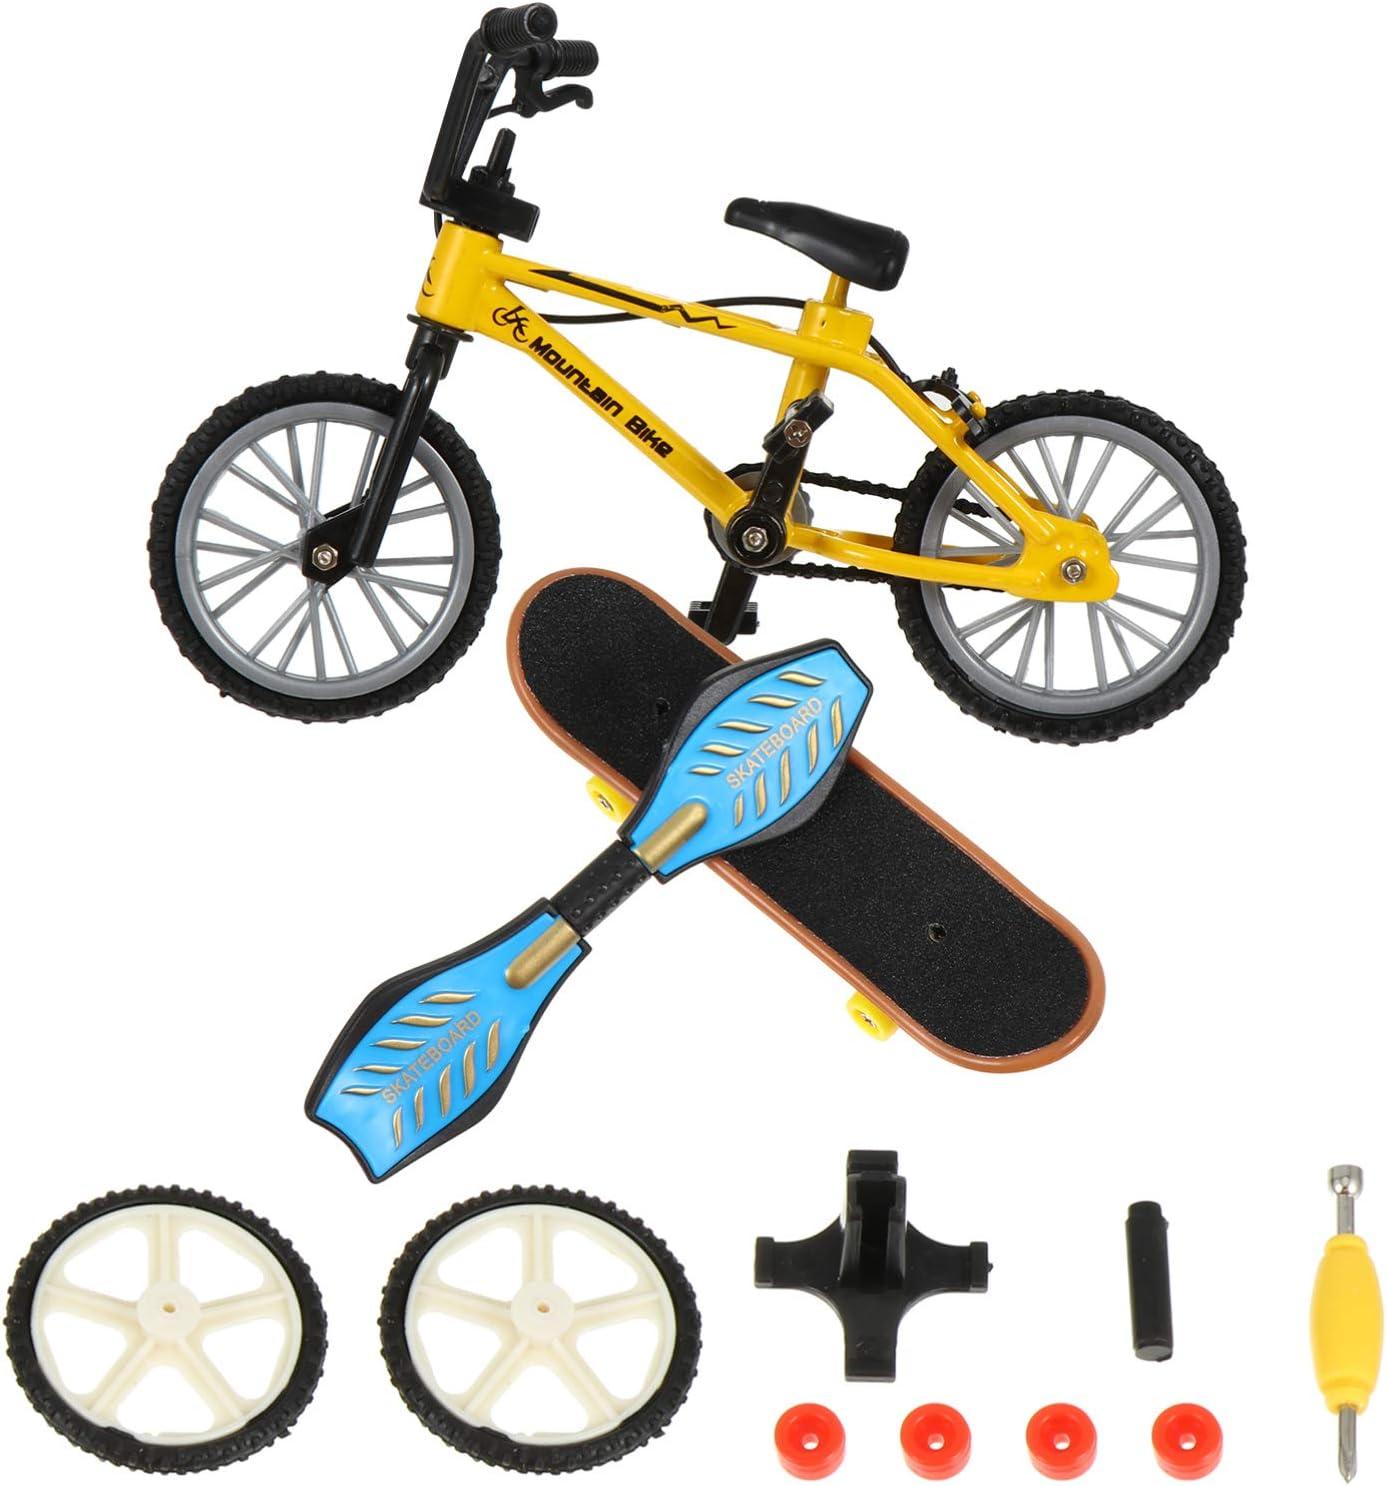 KESYOO New Free Shipping online shopping 1 Set Finger Toys Mini Skateboards